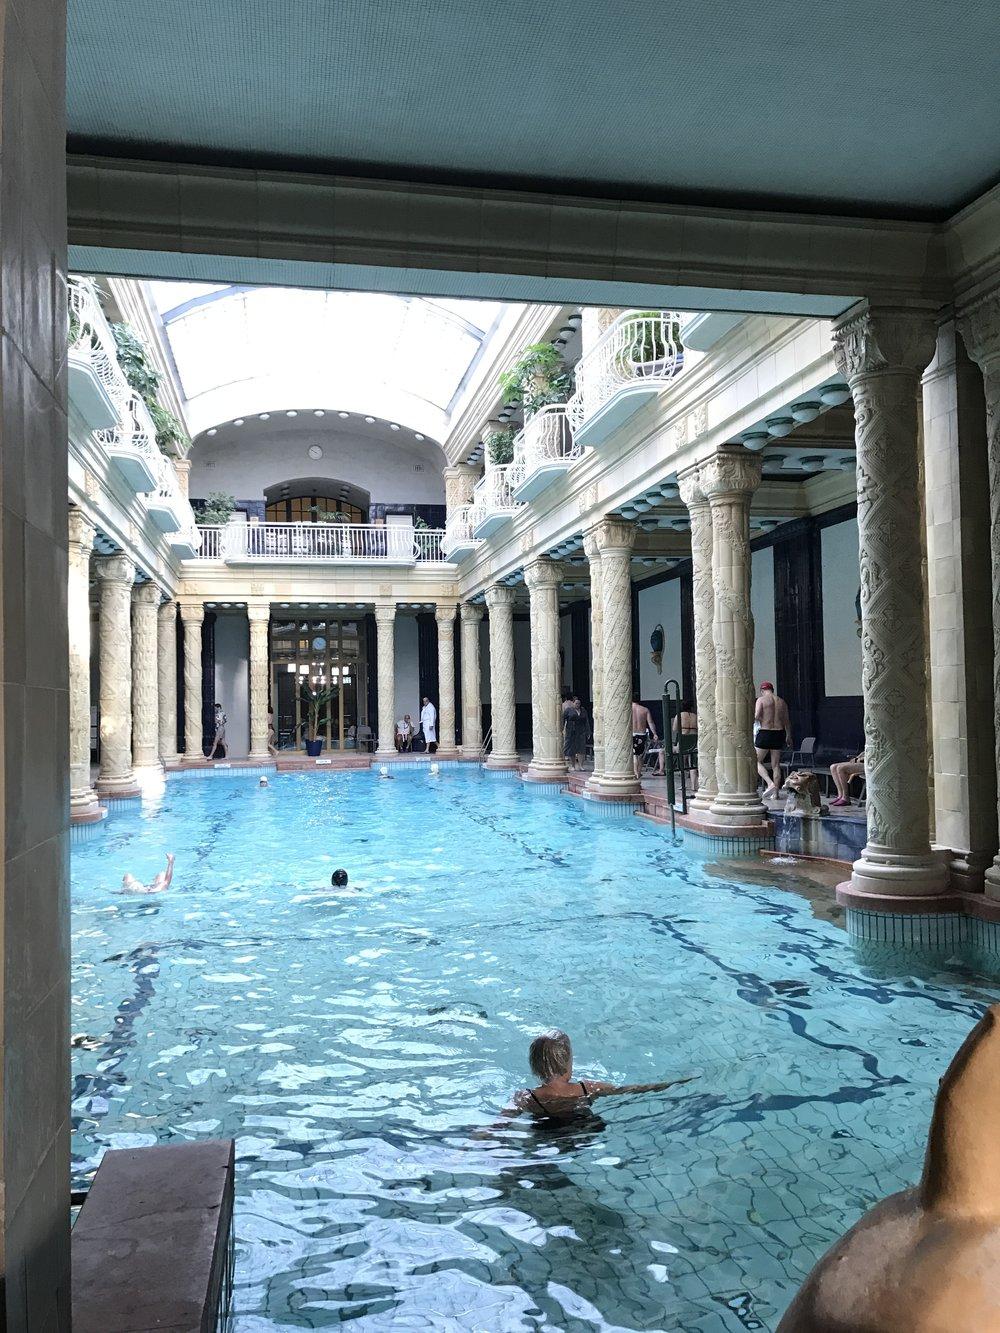 Hotel Gellert Baths